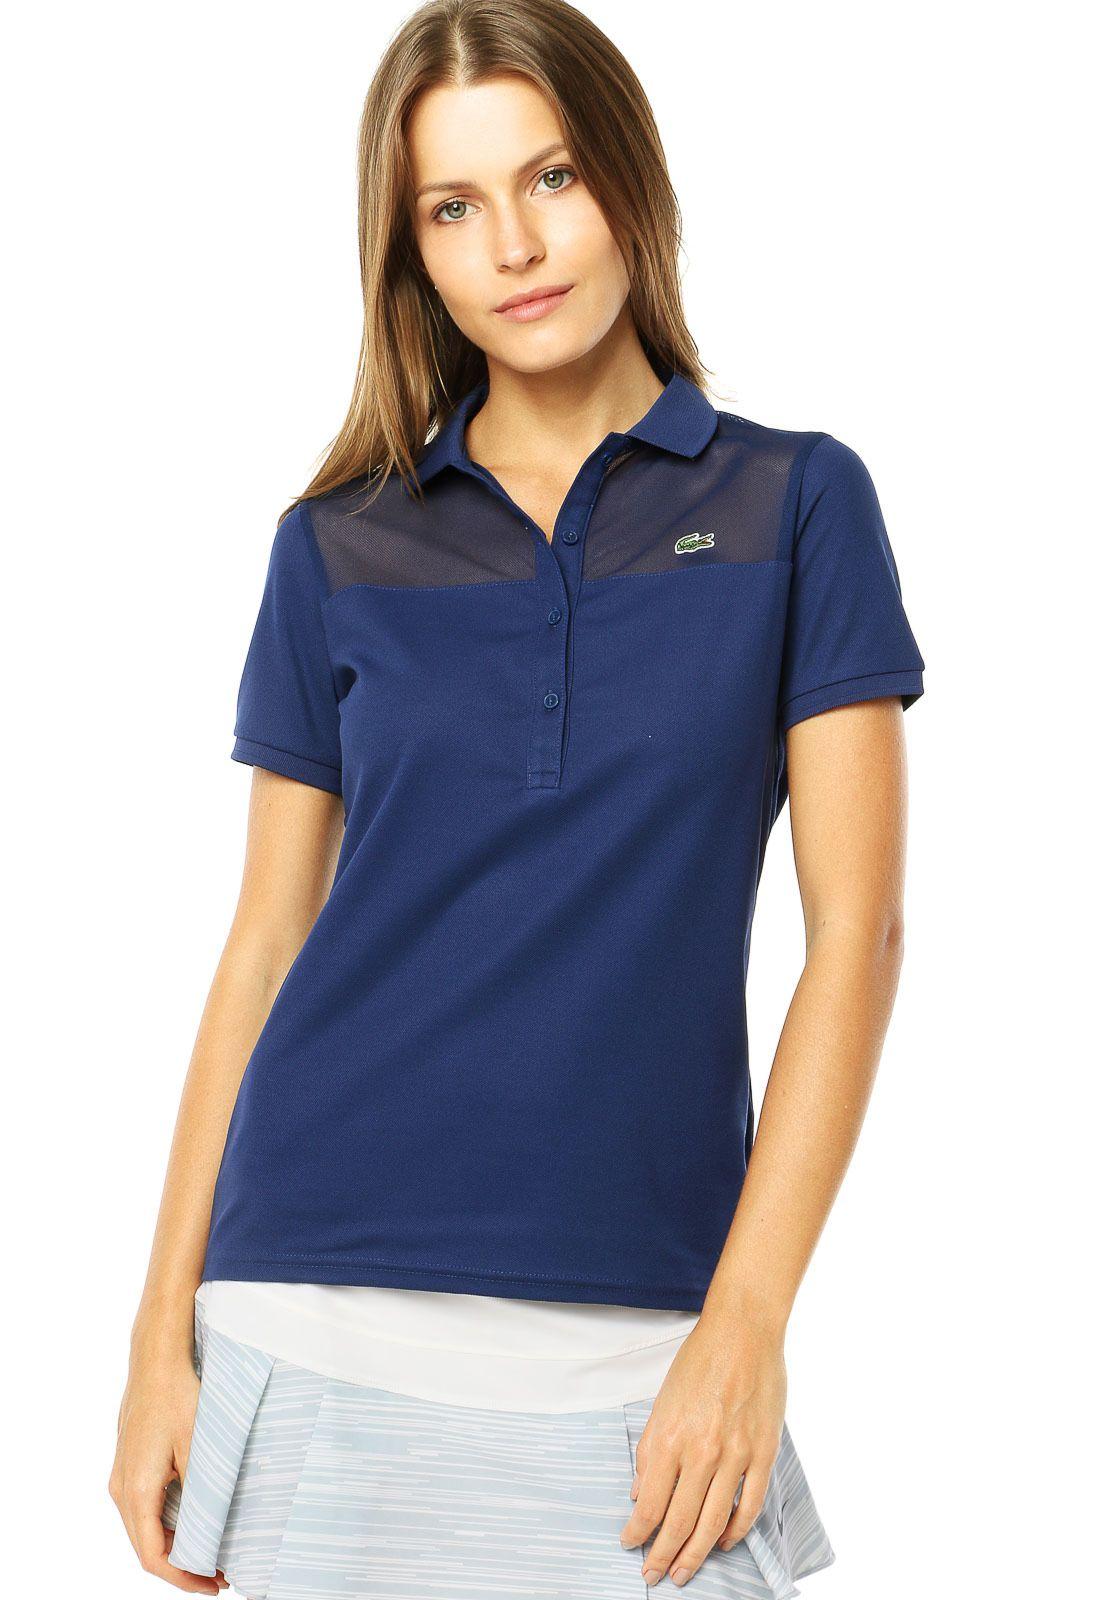 Camisa Polo Lacoste Recorte Azul - Compre Agora  c01c8bbfd90ce